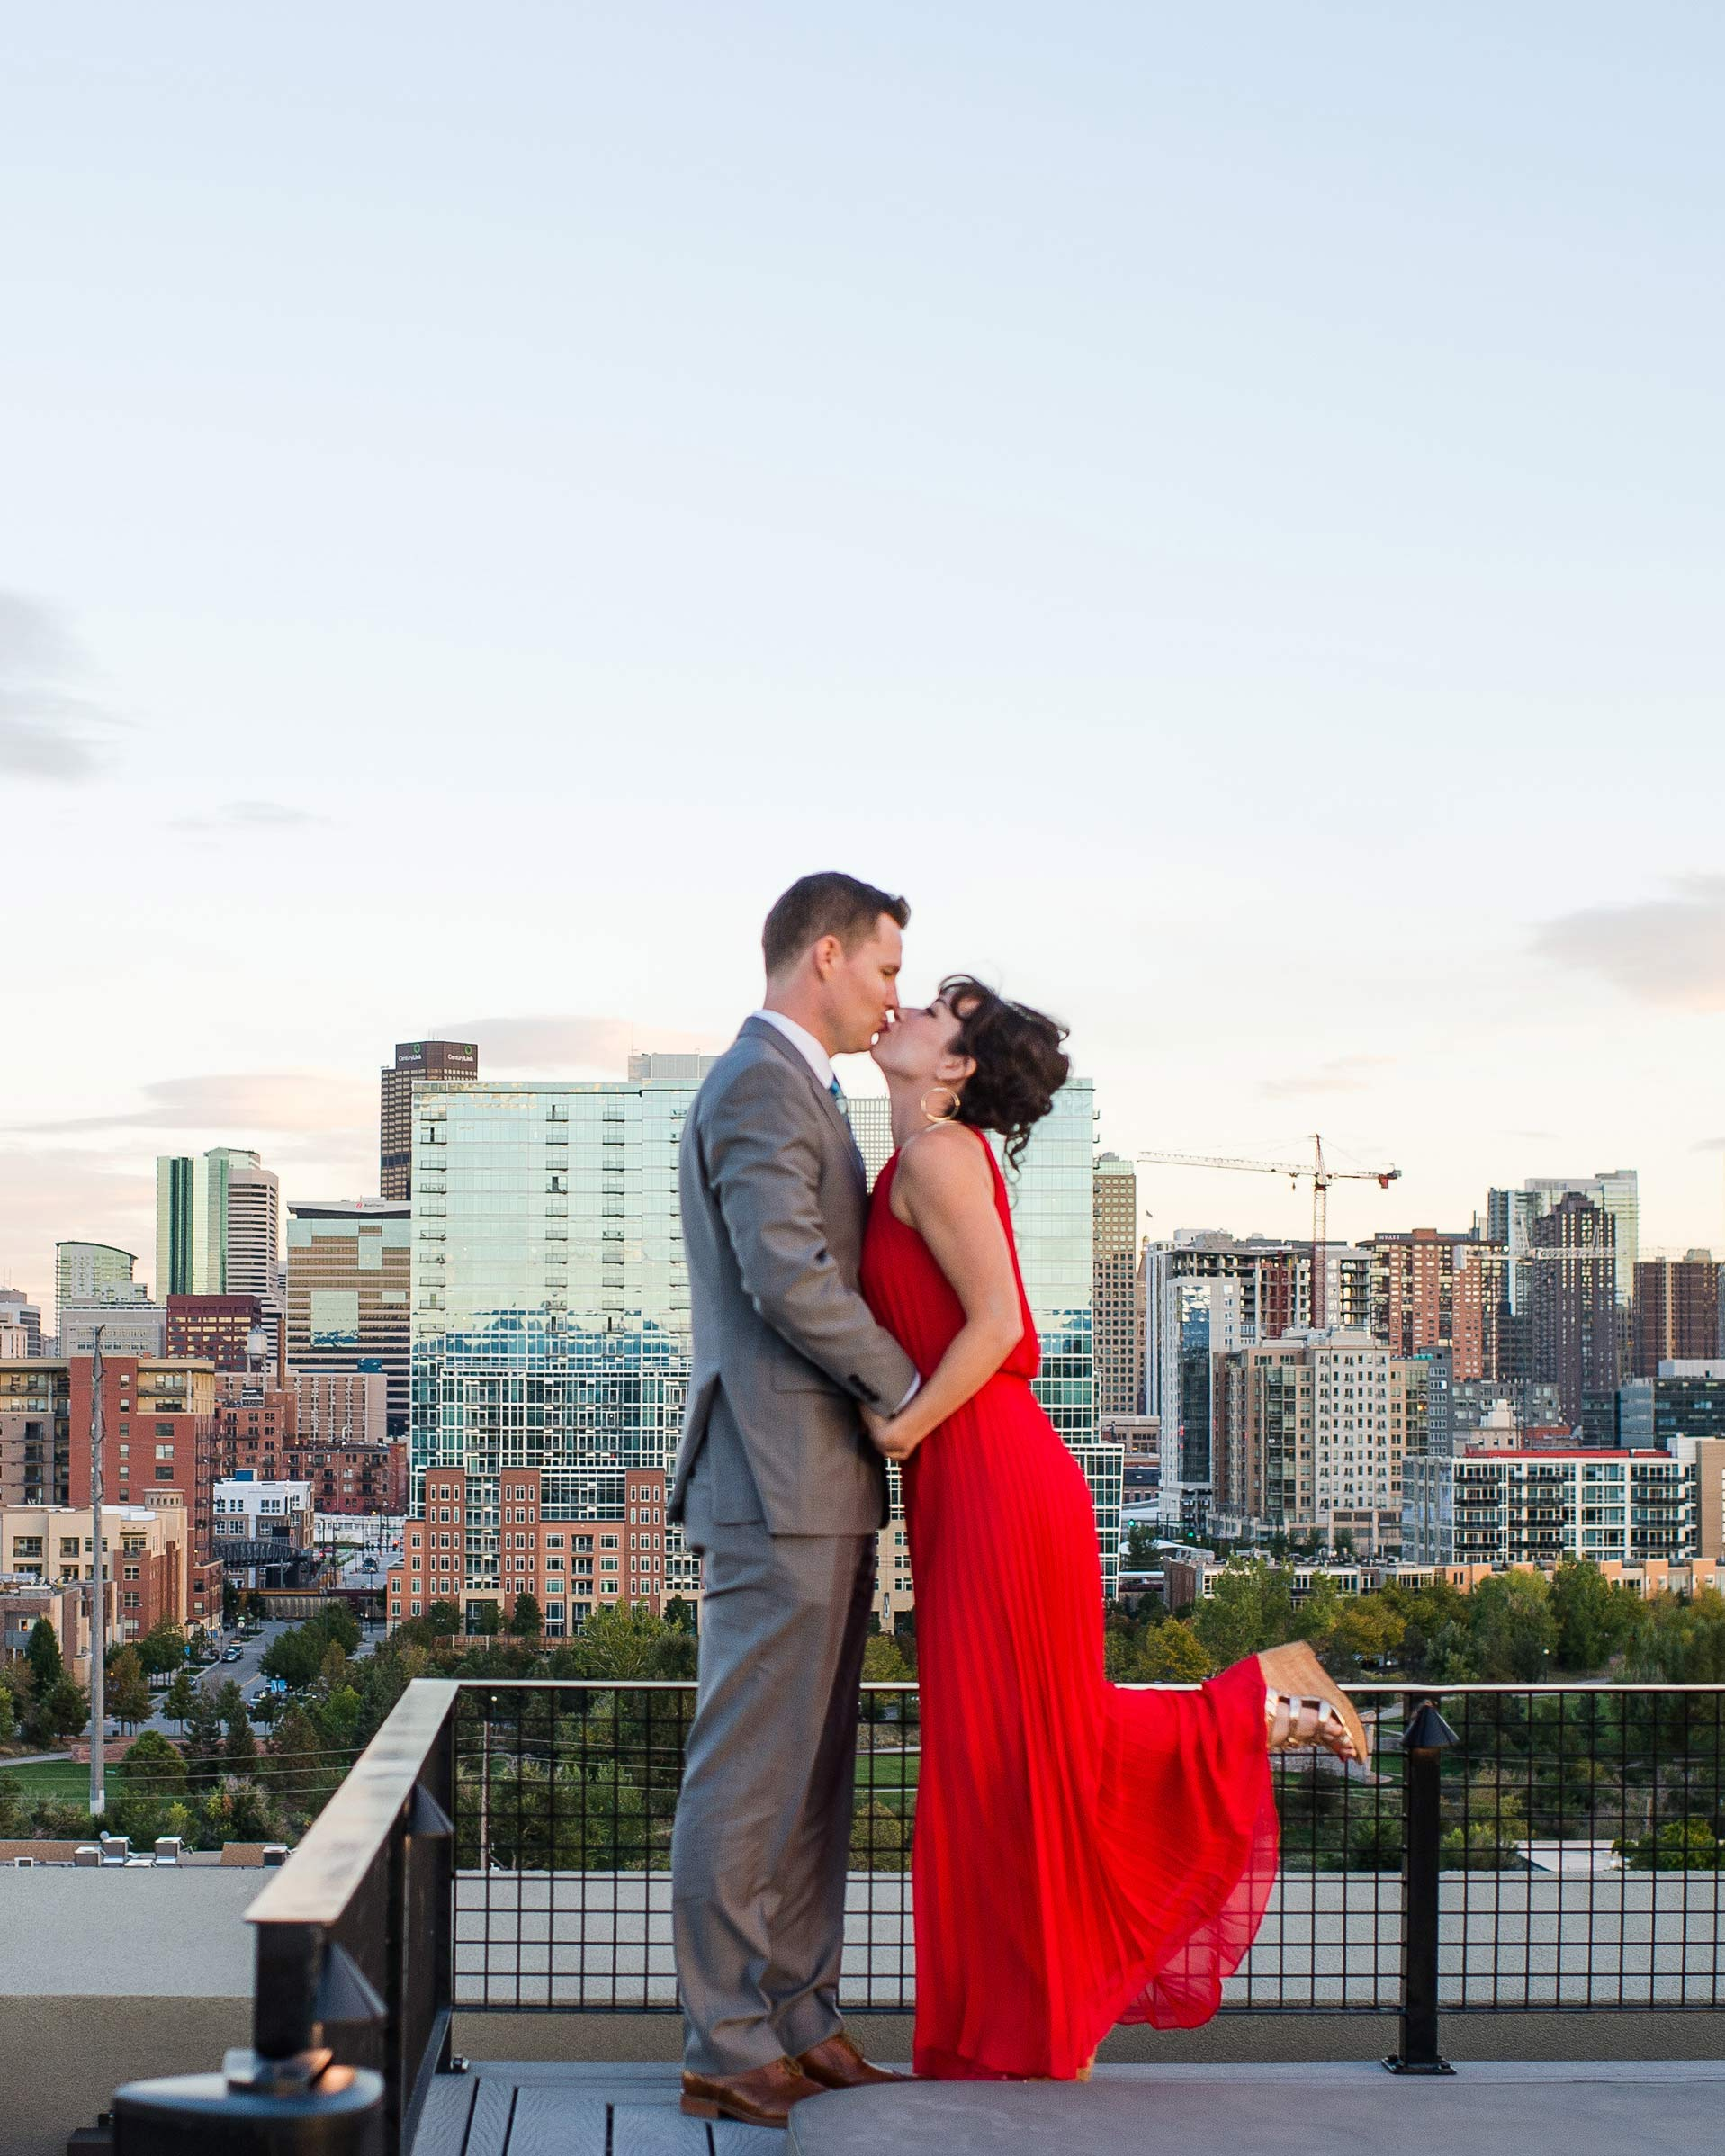 red-wedding-dress-kara-pearson-0216.jpg